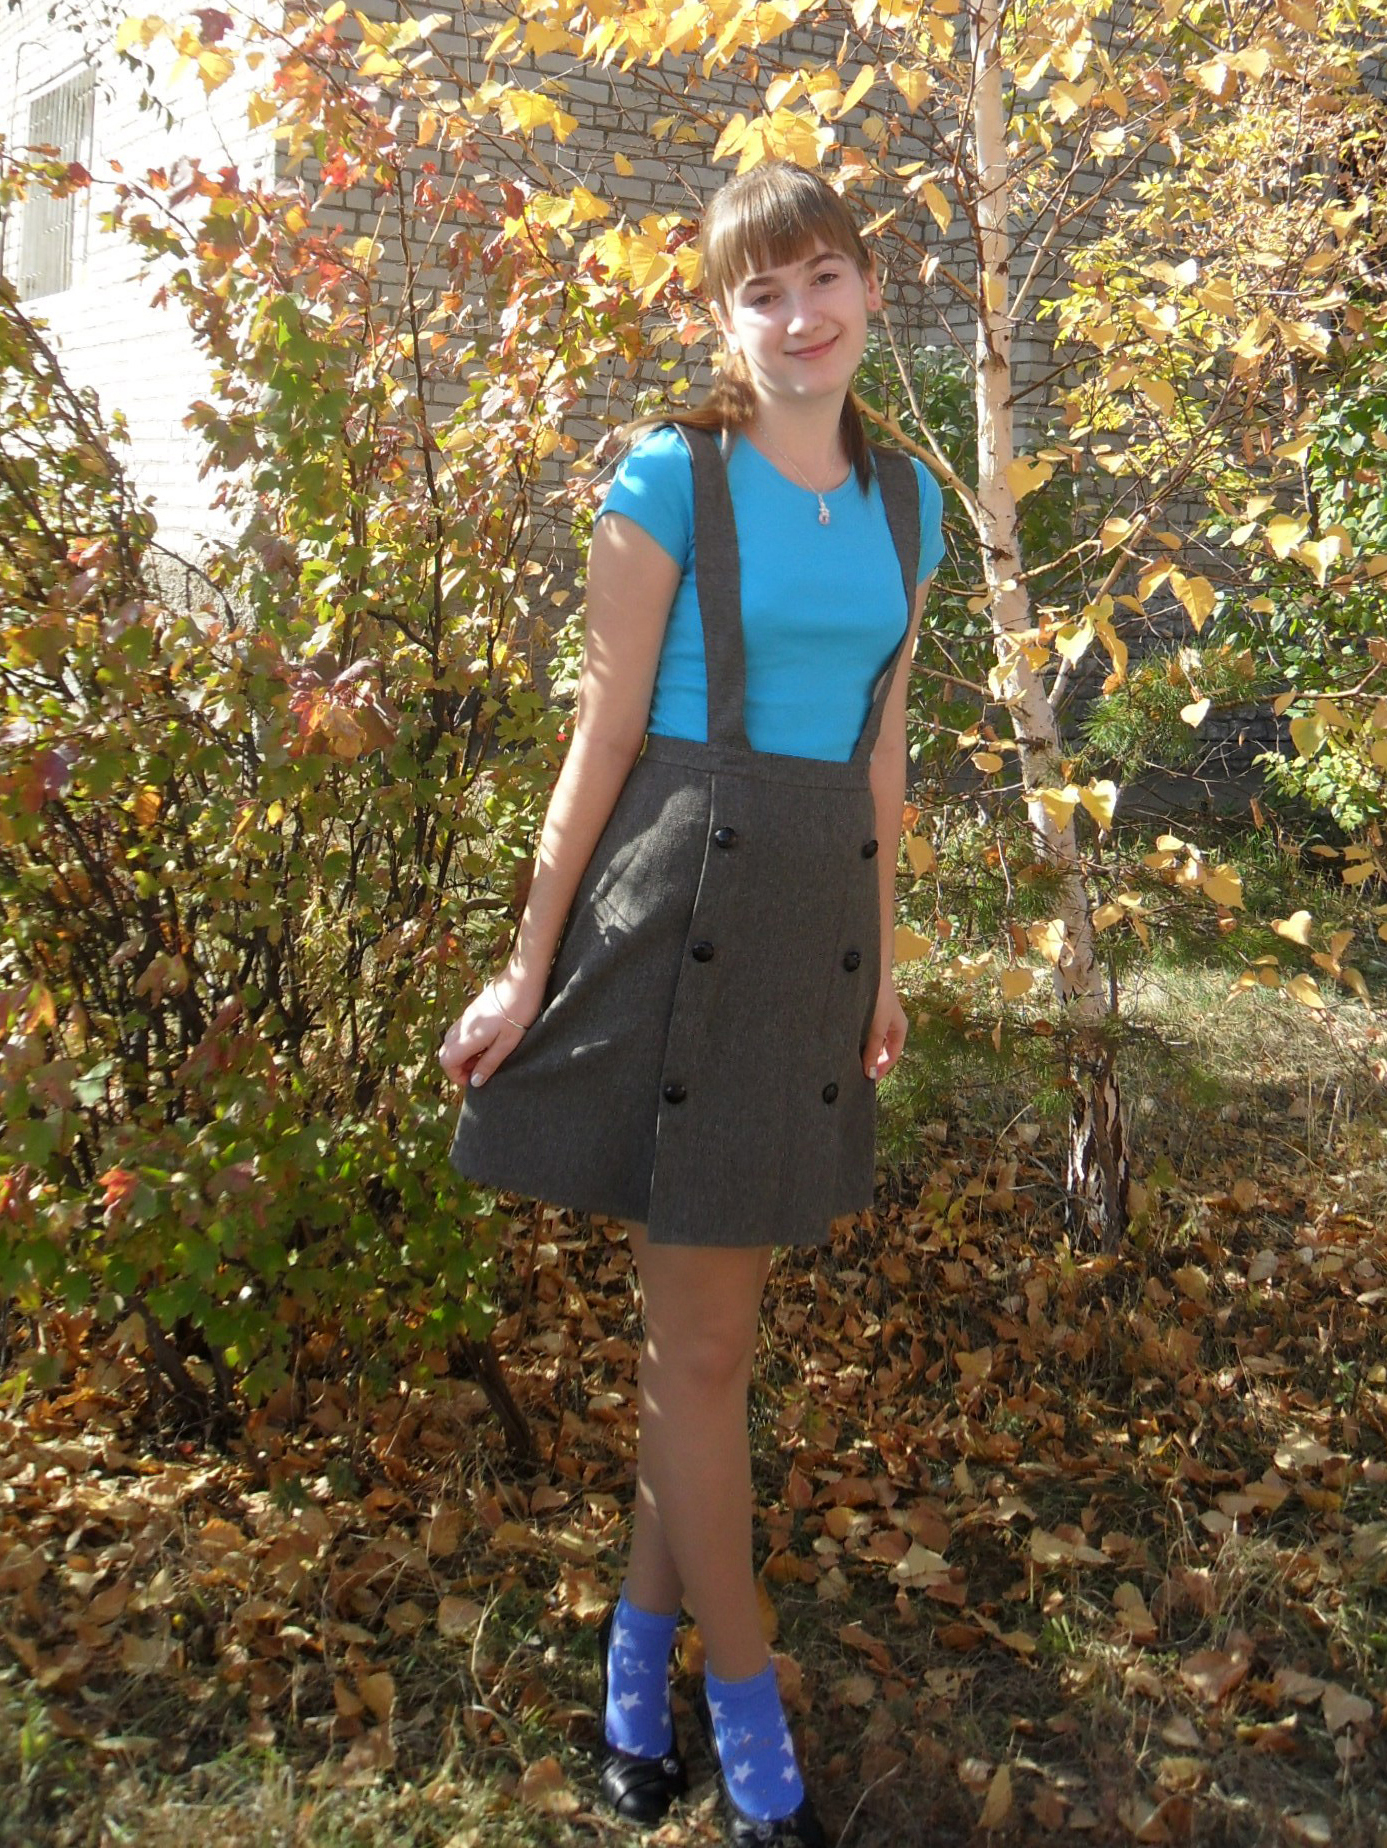 Sparkling schoolgirl 2 by tanya6991